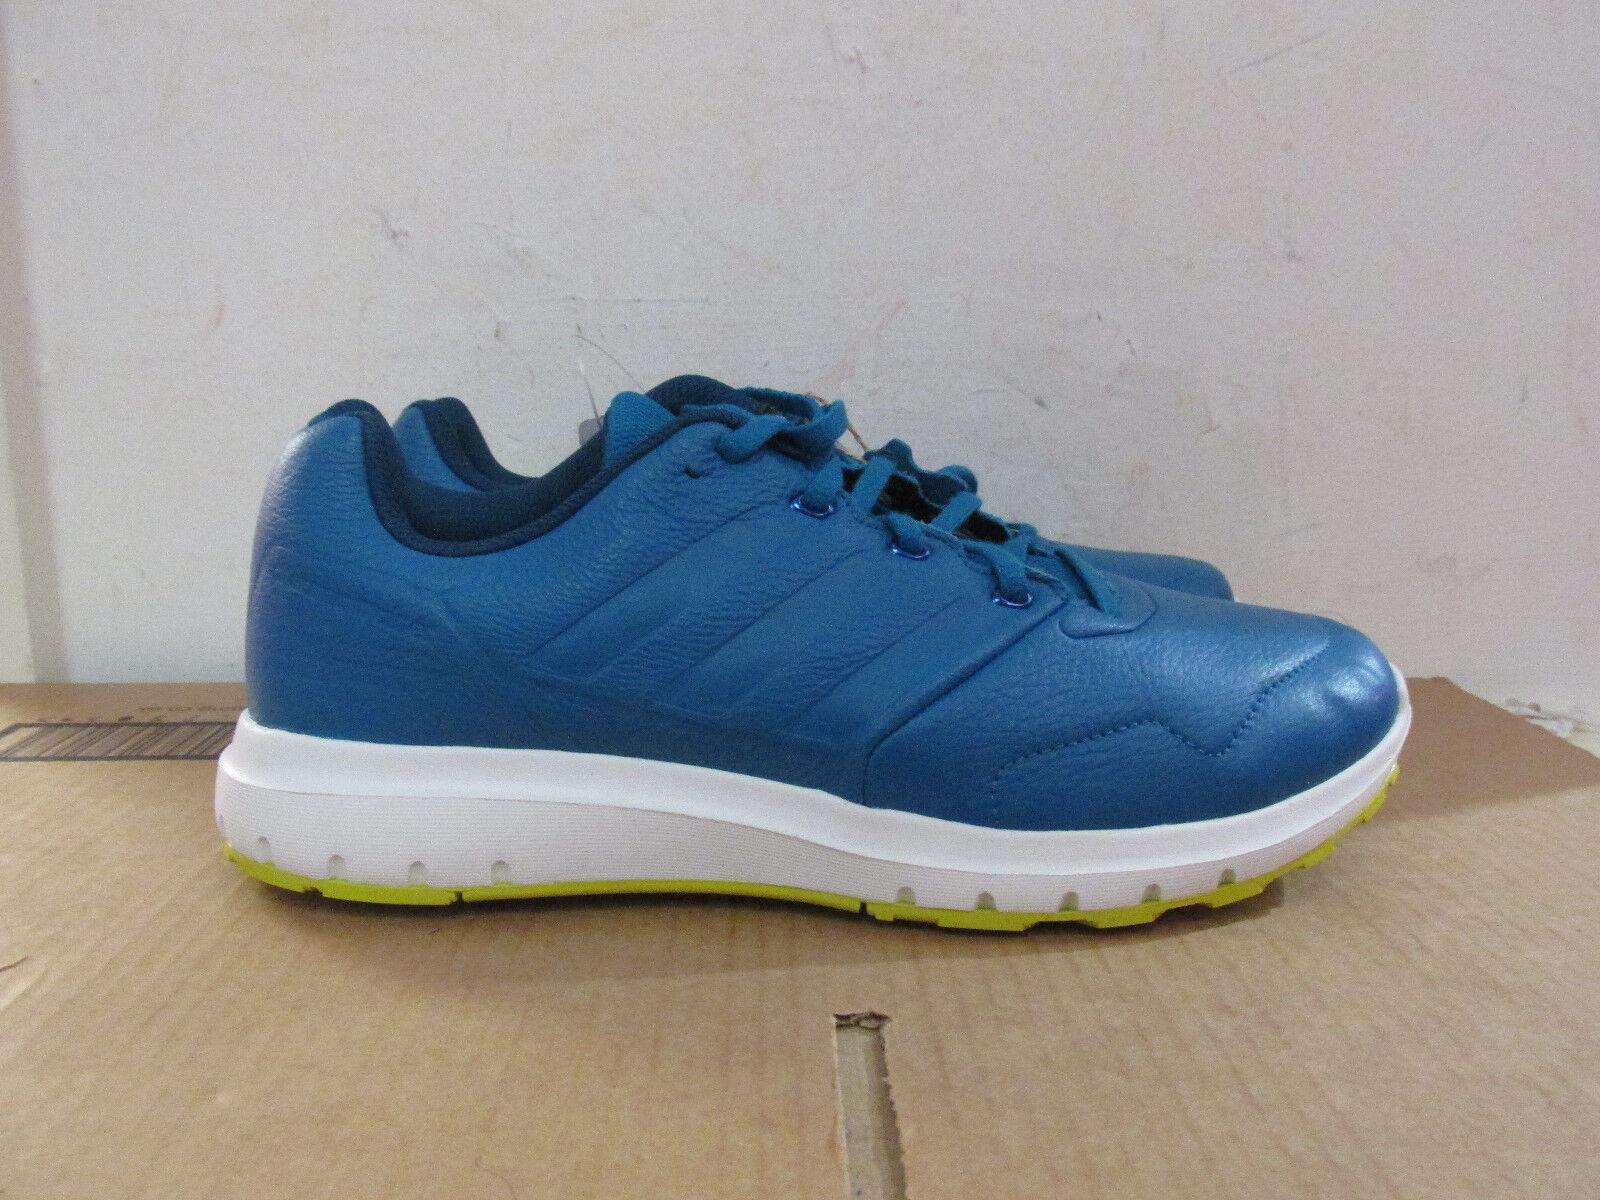 Adidas Turnschuhe Duramo Leder AQ4266 Herren Turnschuhe Adidas Sneakers Probe 570fba